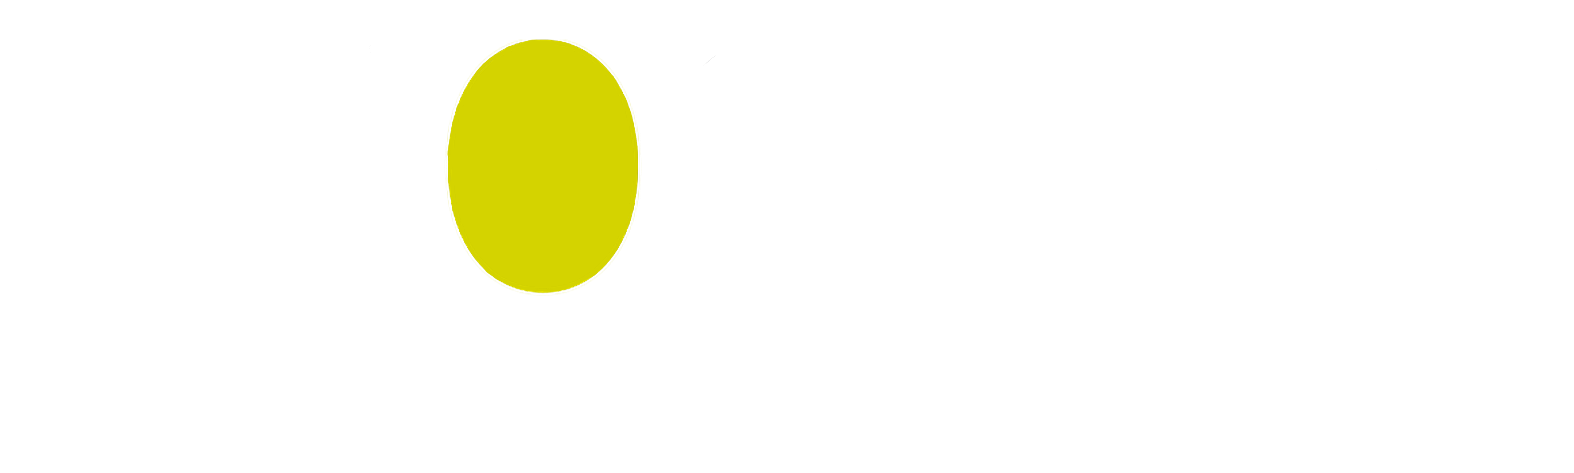 Inpunkto